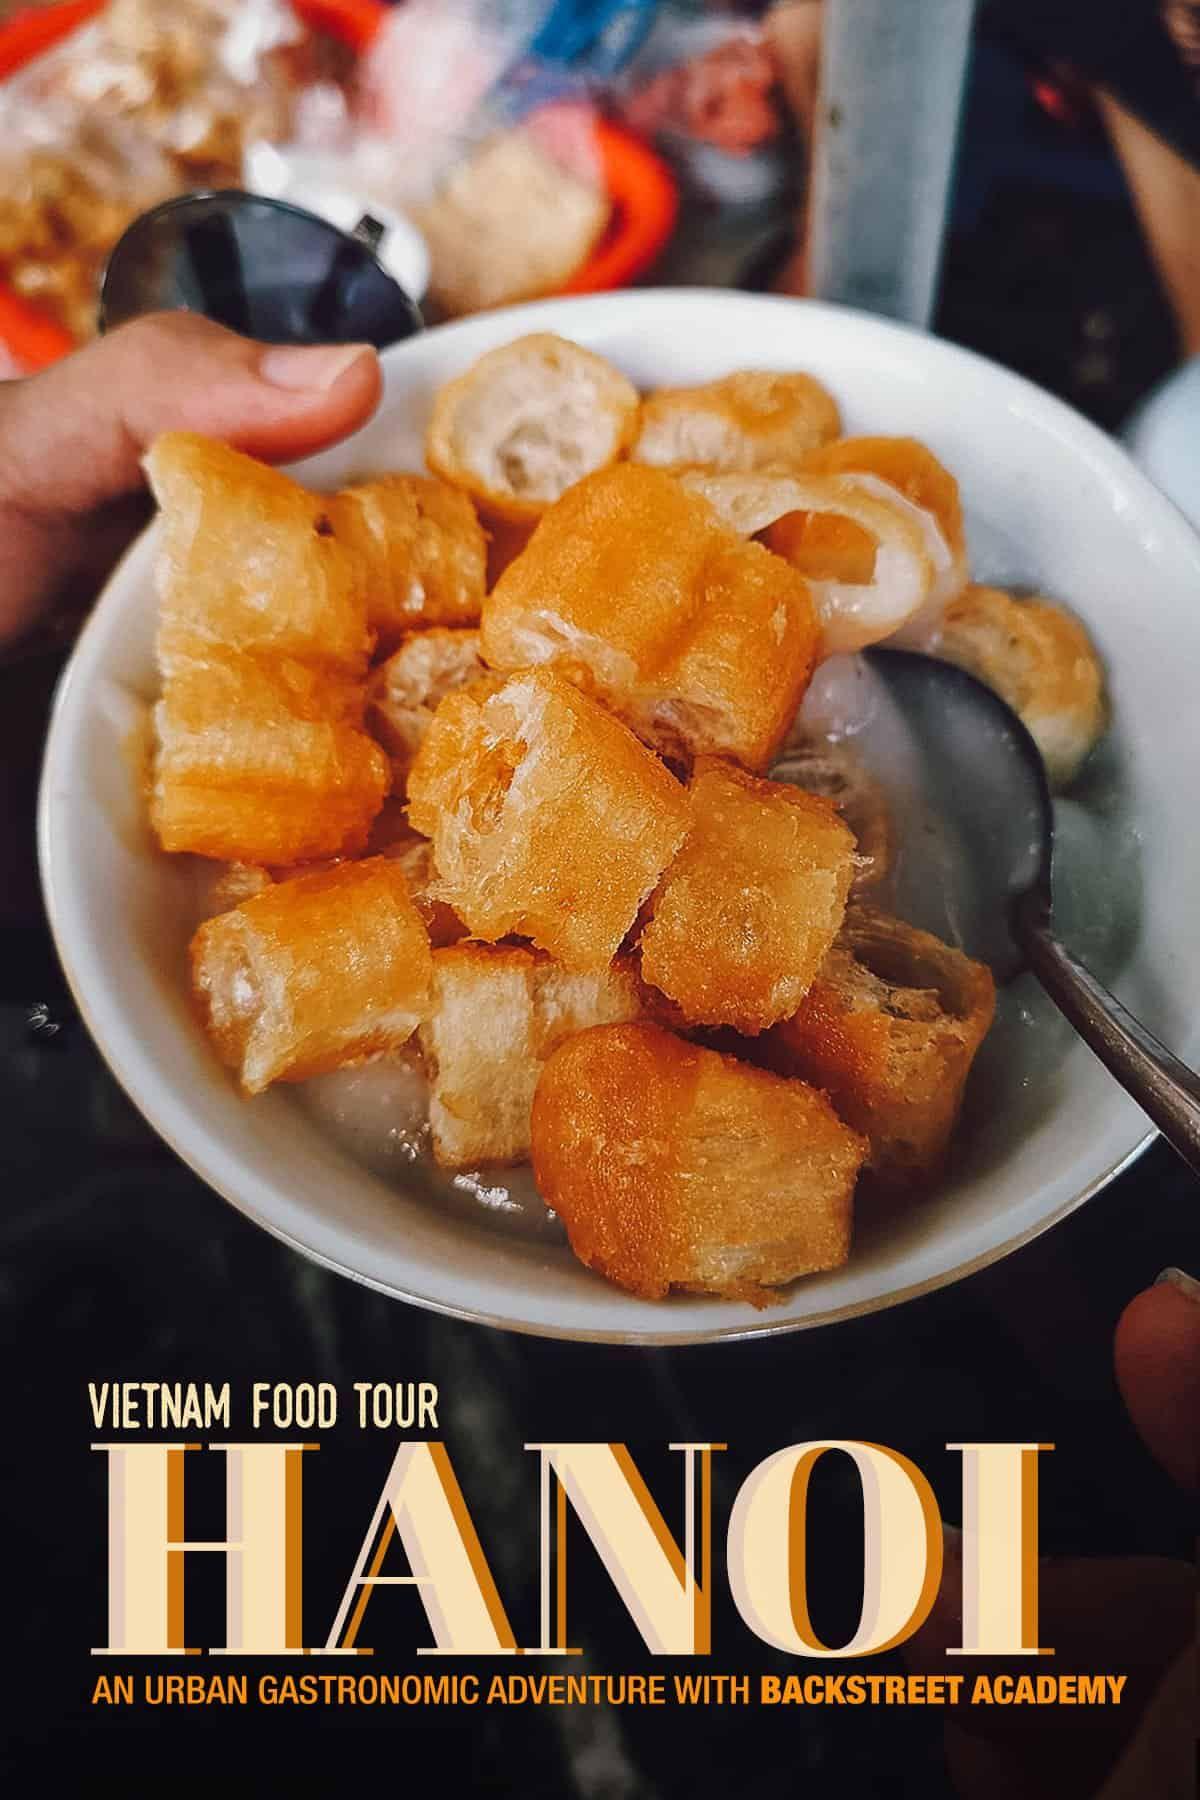 Hanoi street food tour a gastronomic adventure with